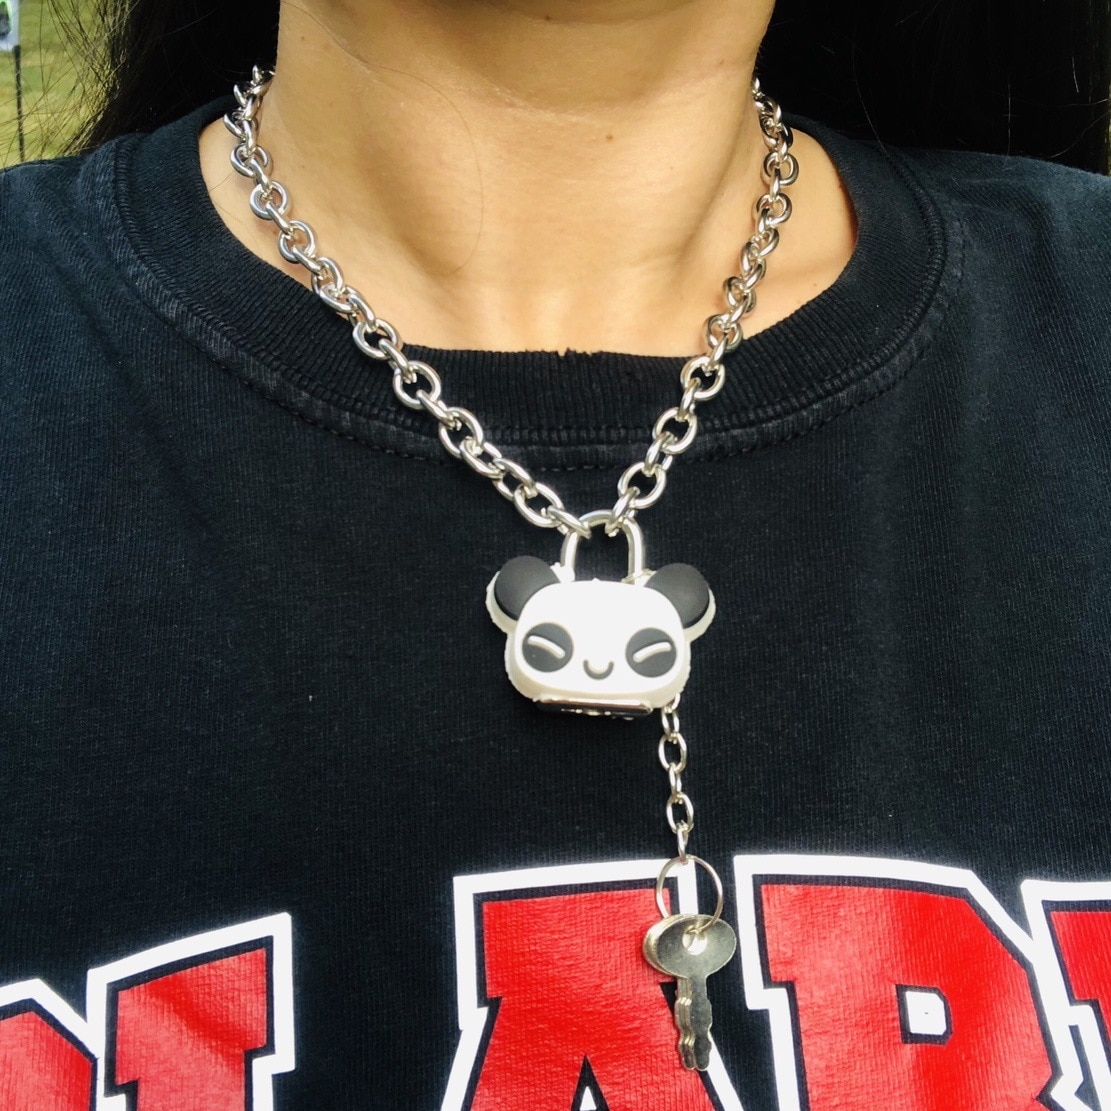 Collar de cadena de clavícula Punk de Chica oscura, colgante de bloqueo de Panda, collar de chica de tierra fresca Bundy